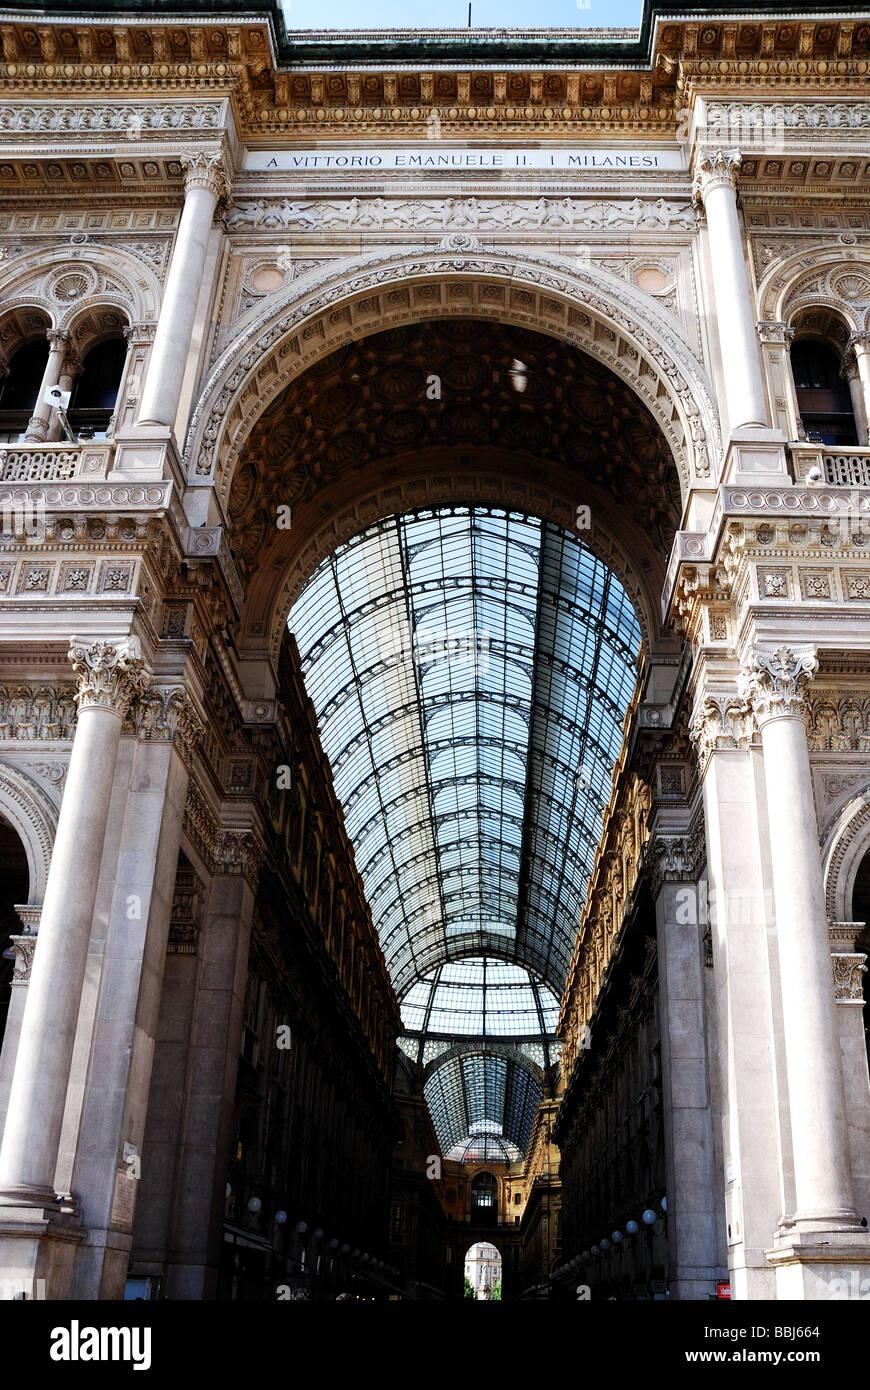 Historische Galleria Vittorio Emanuele in Mailand Stockbild